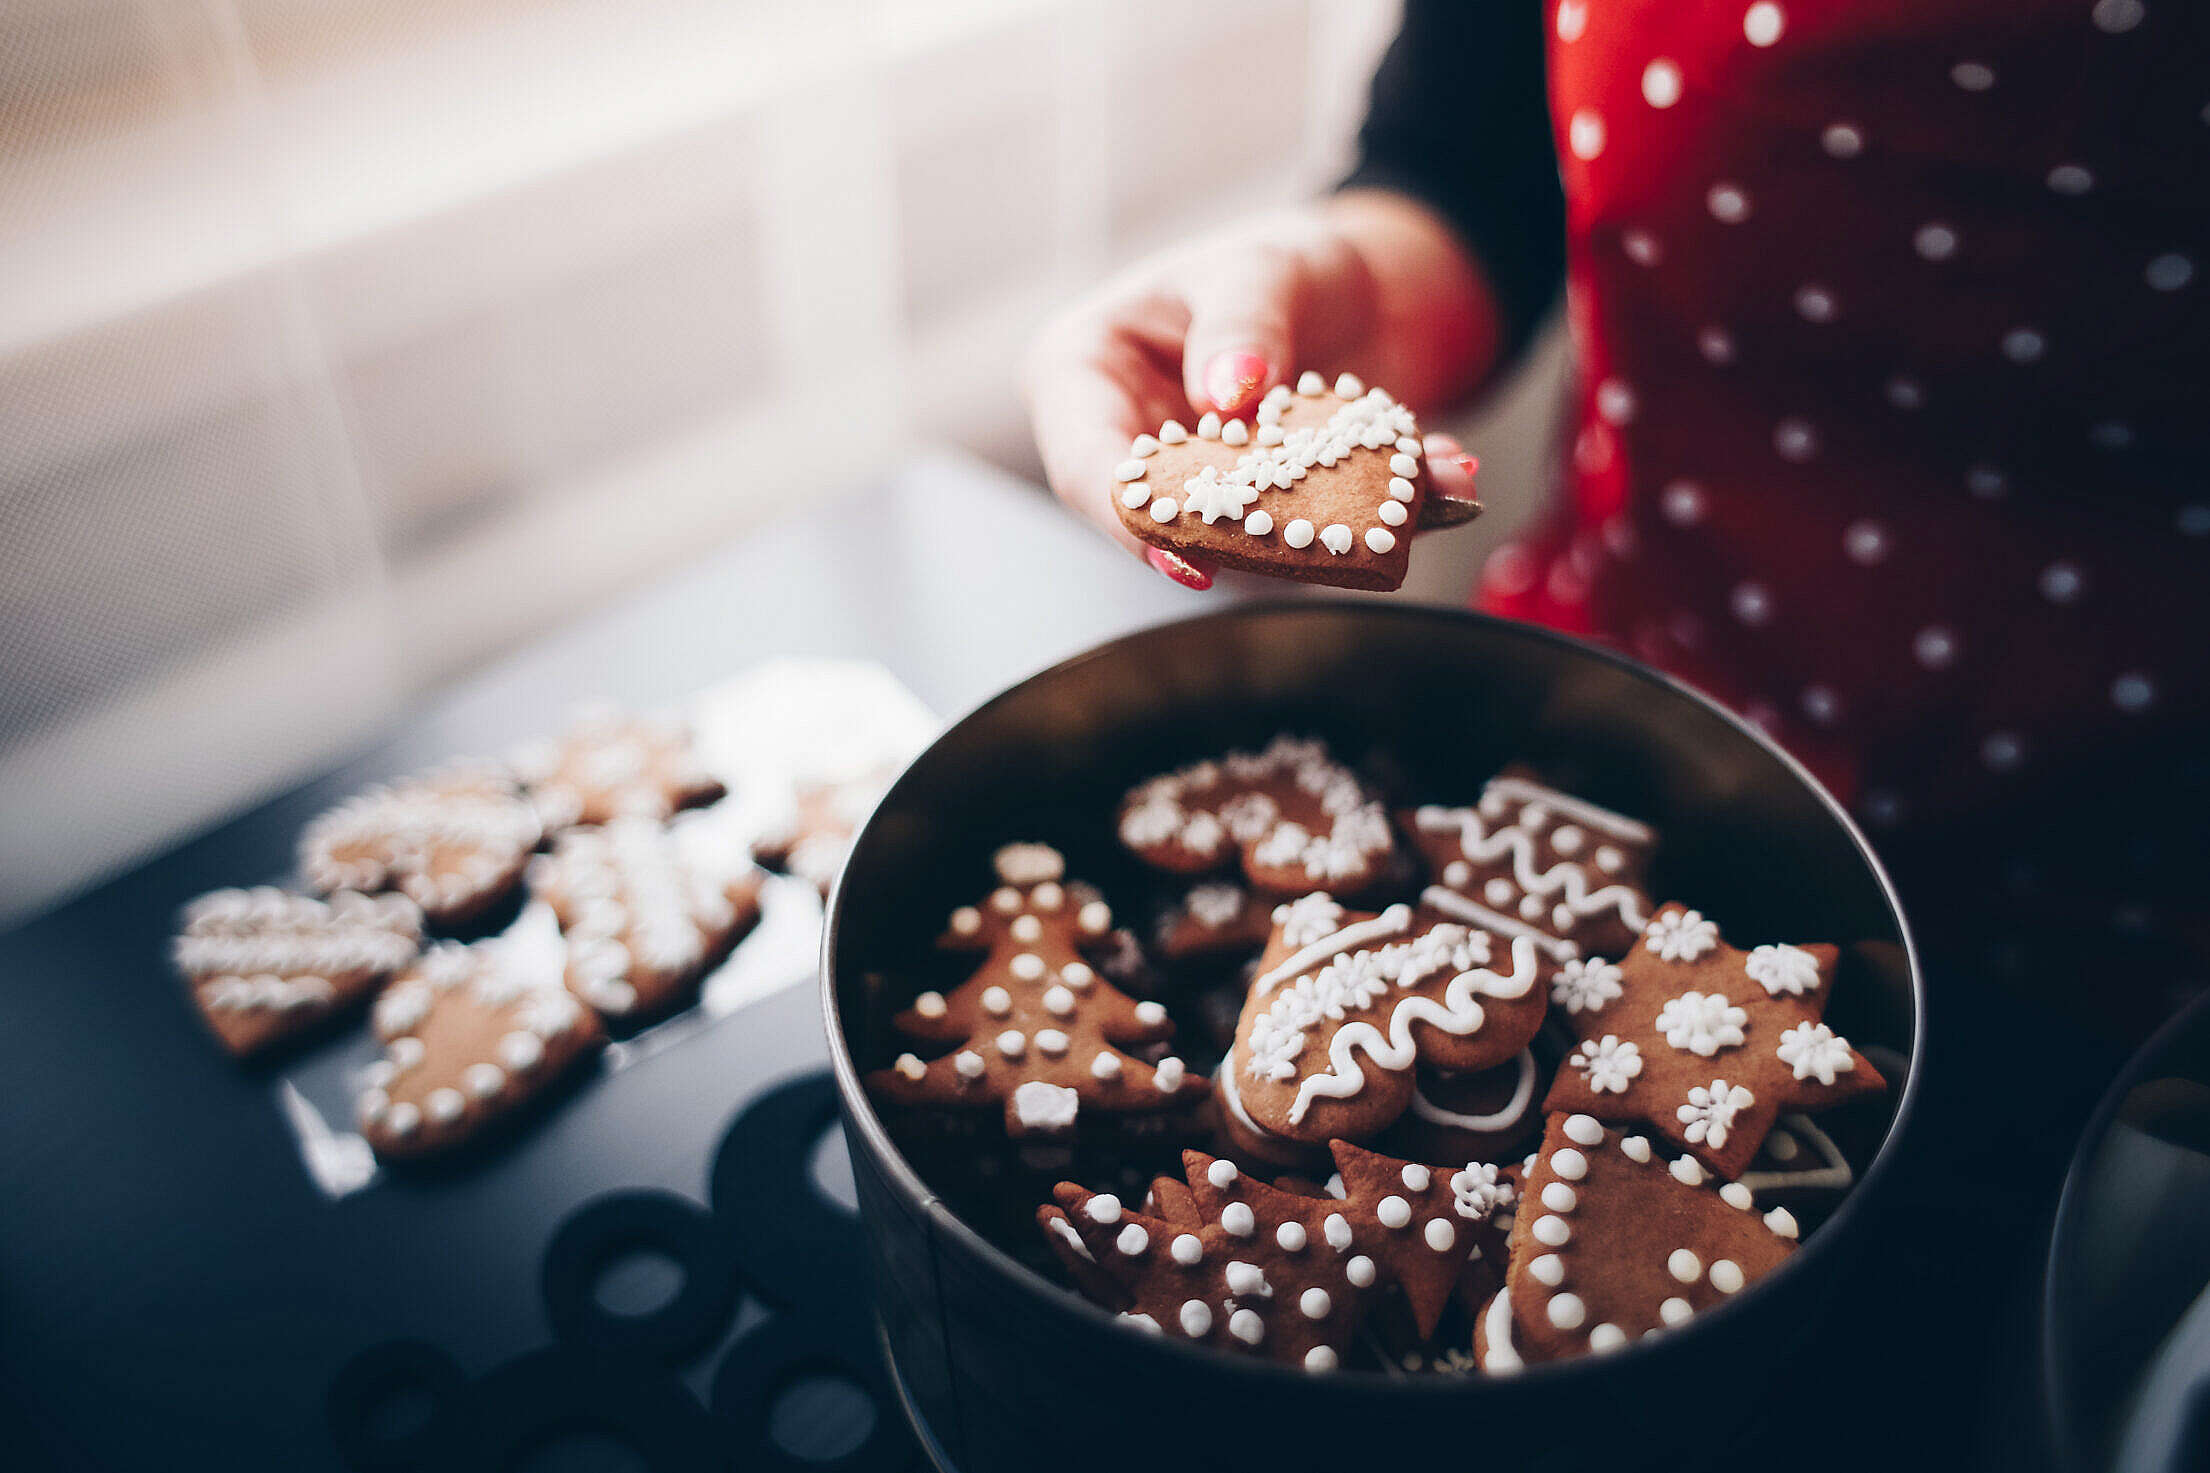 Sweet Christmas Gingerbread Cookies Free Stock Photo